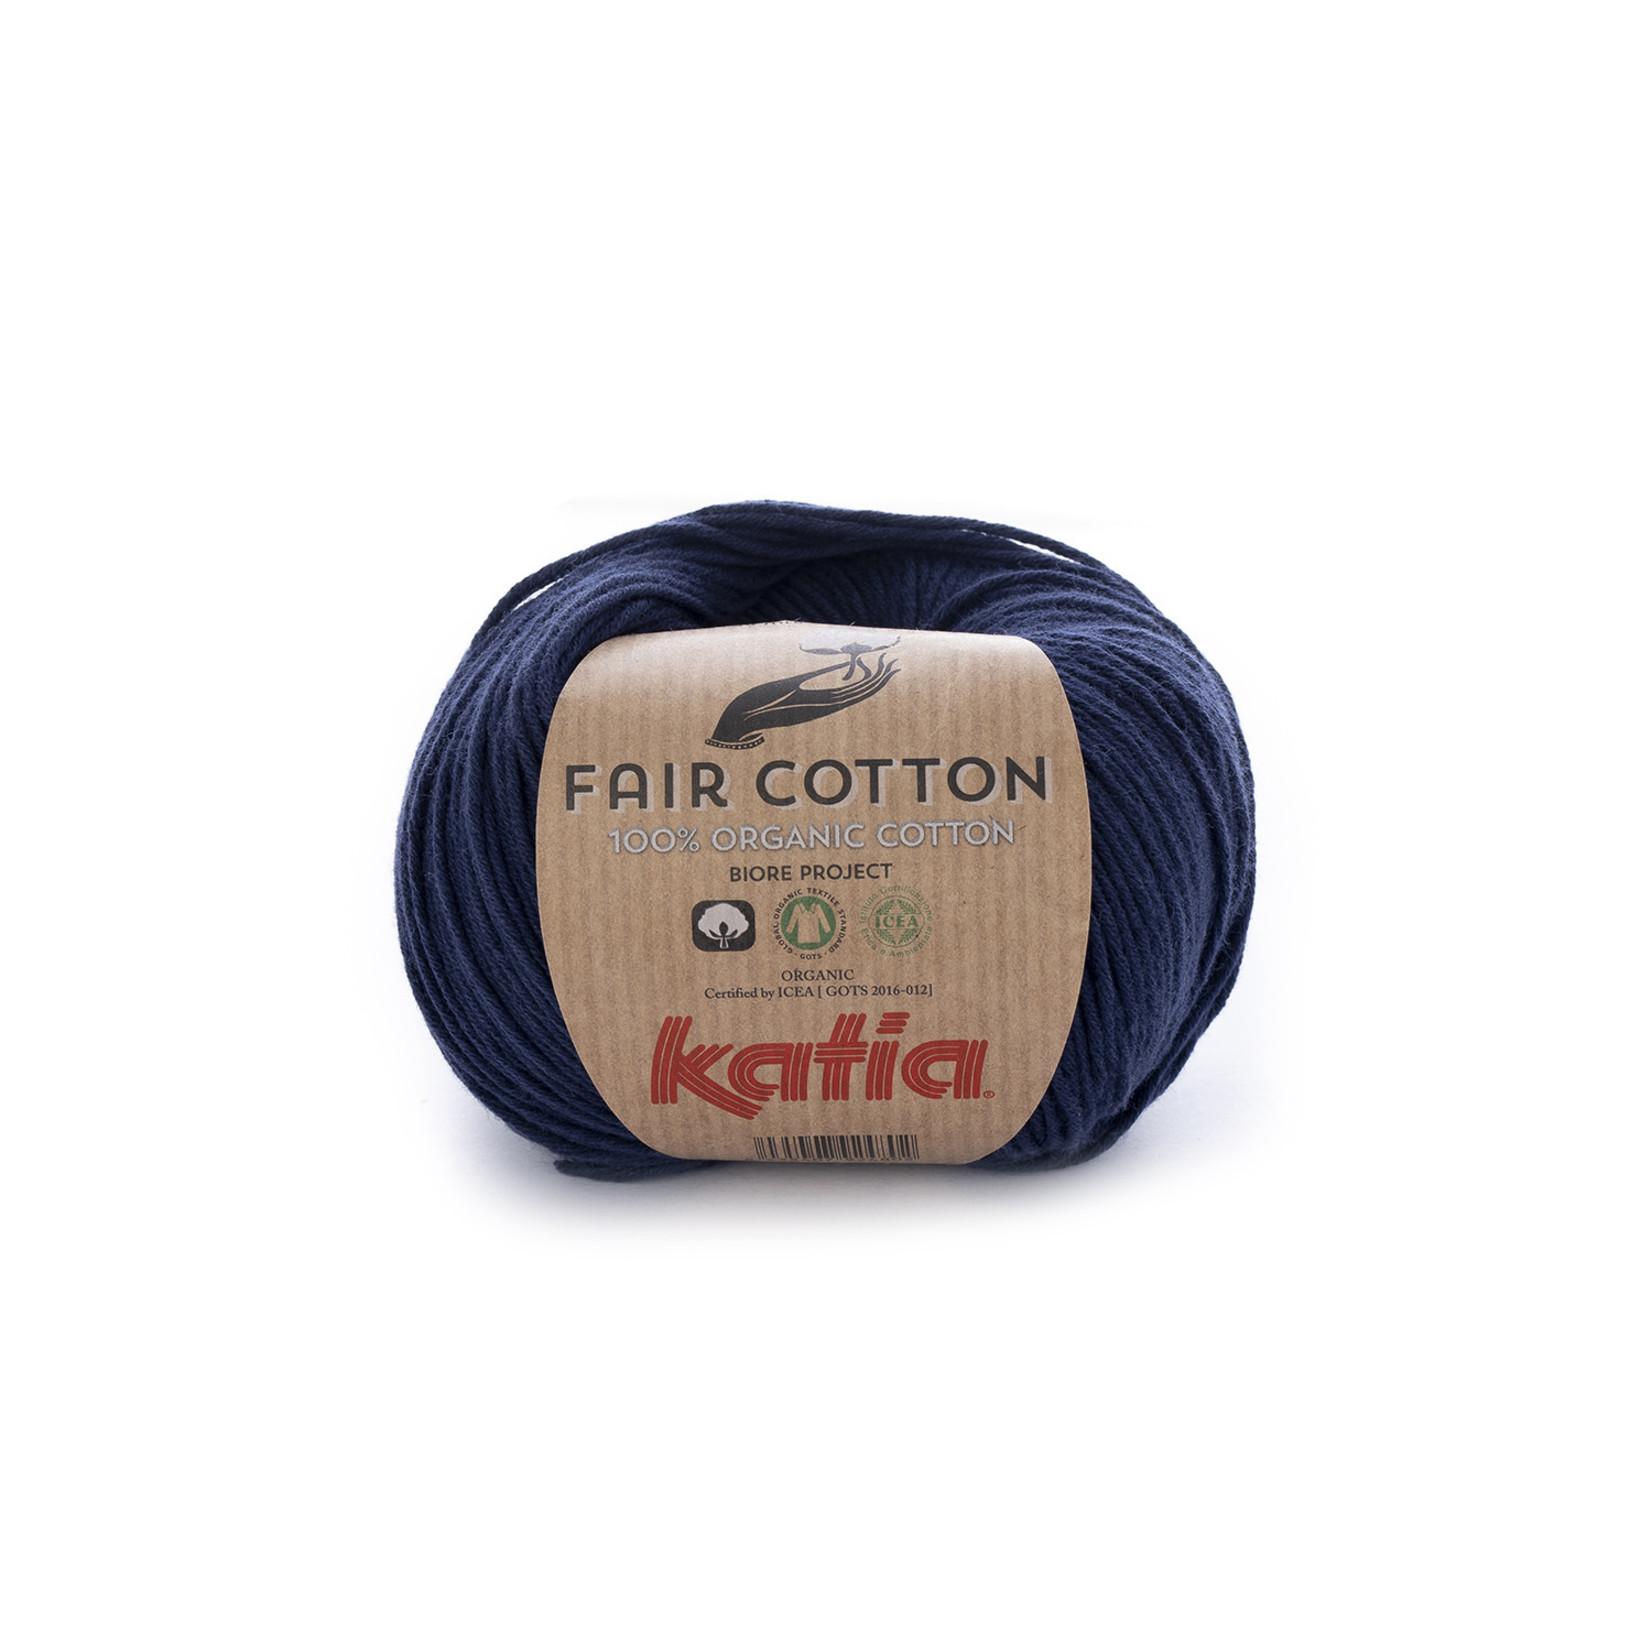 Katia Katia Fair Cotton 5 - donkerblauw - 1 bol = 50 gr. = 155 m. - 100% biol. katoen